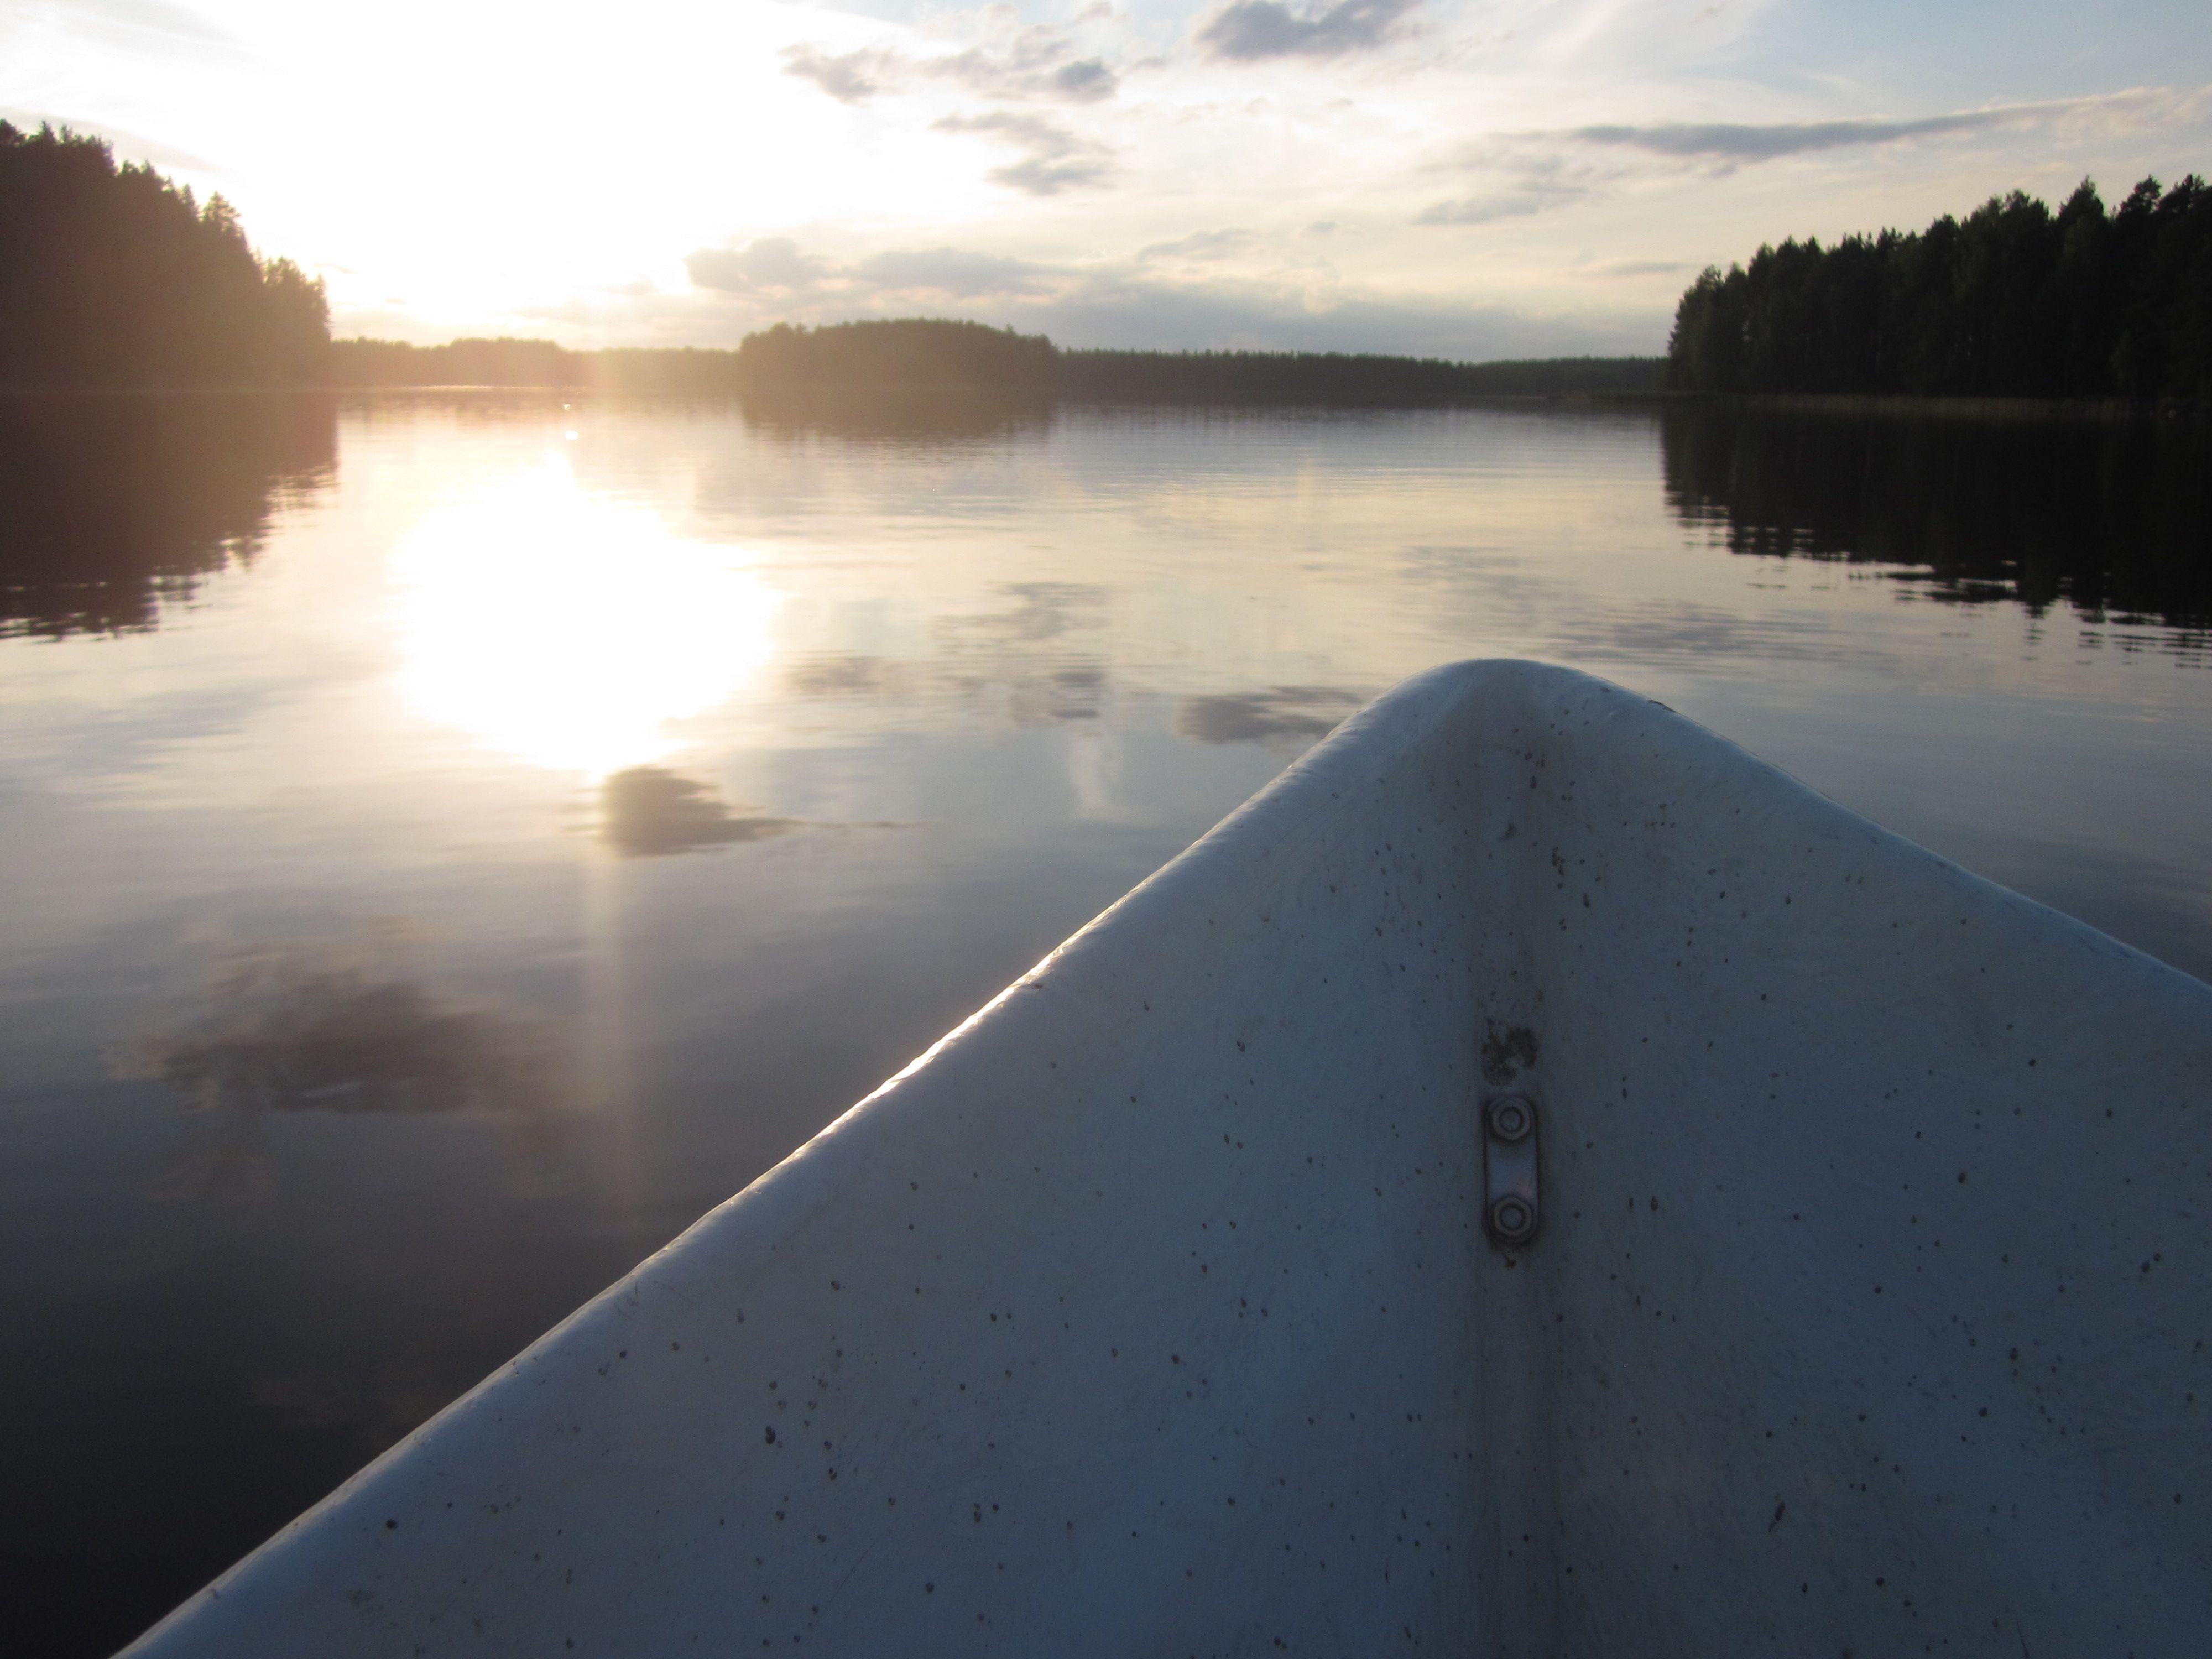 So silent, so beautiful moment in Kivijärvi lake. #kivijaervi #moment #Finland #august